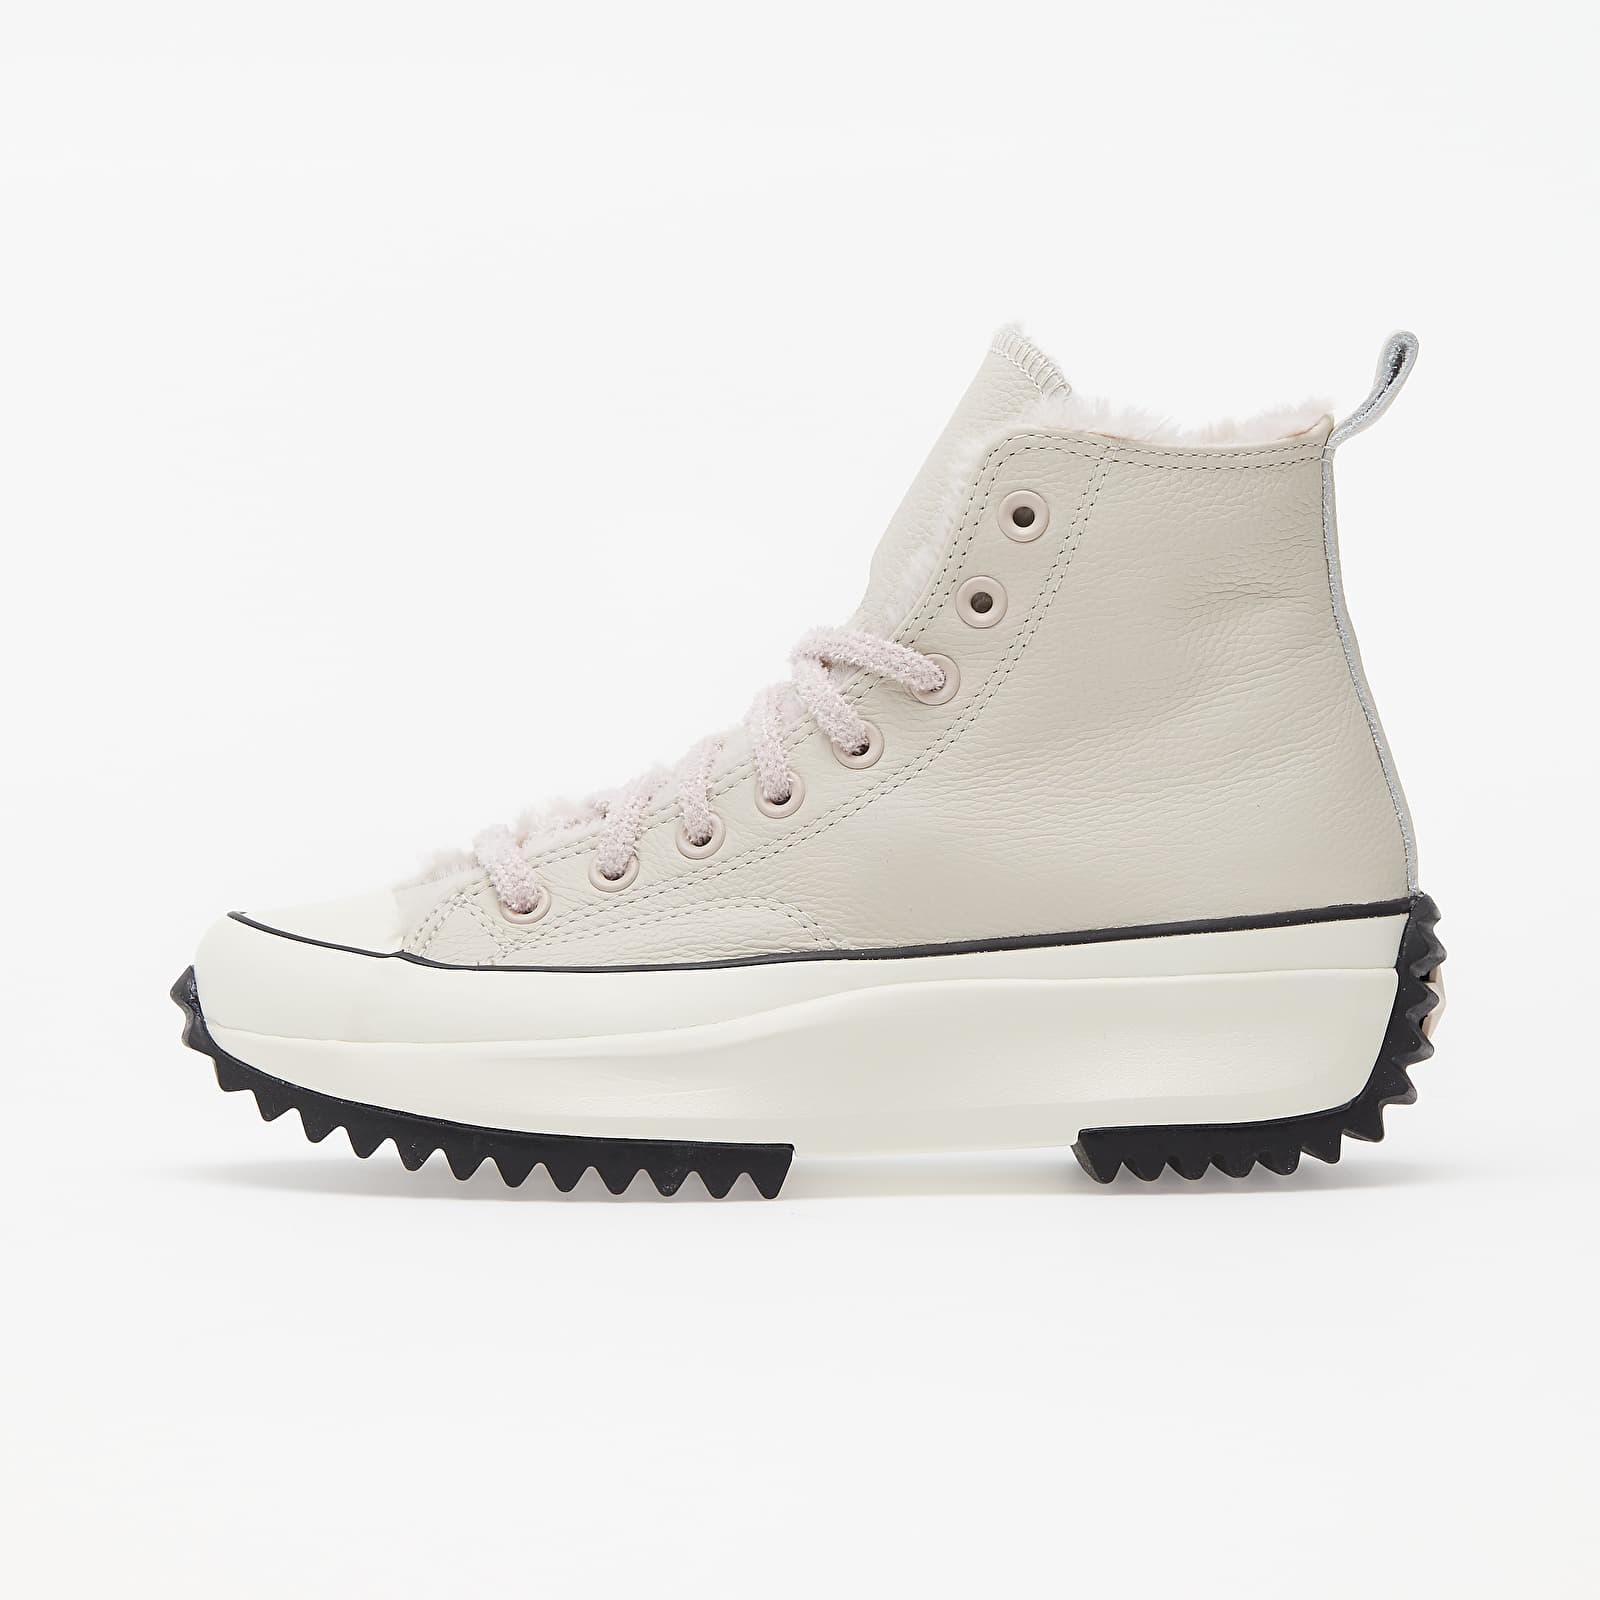 Men's shoes Converse Run Star Hike Lt Orewood Brown/ Silt Red